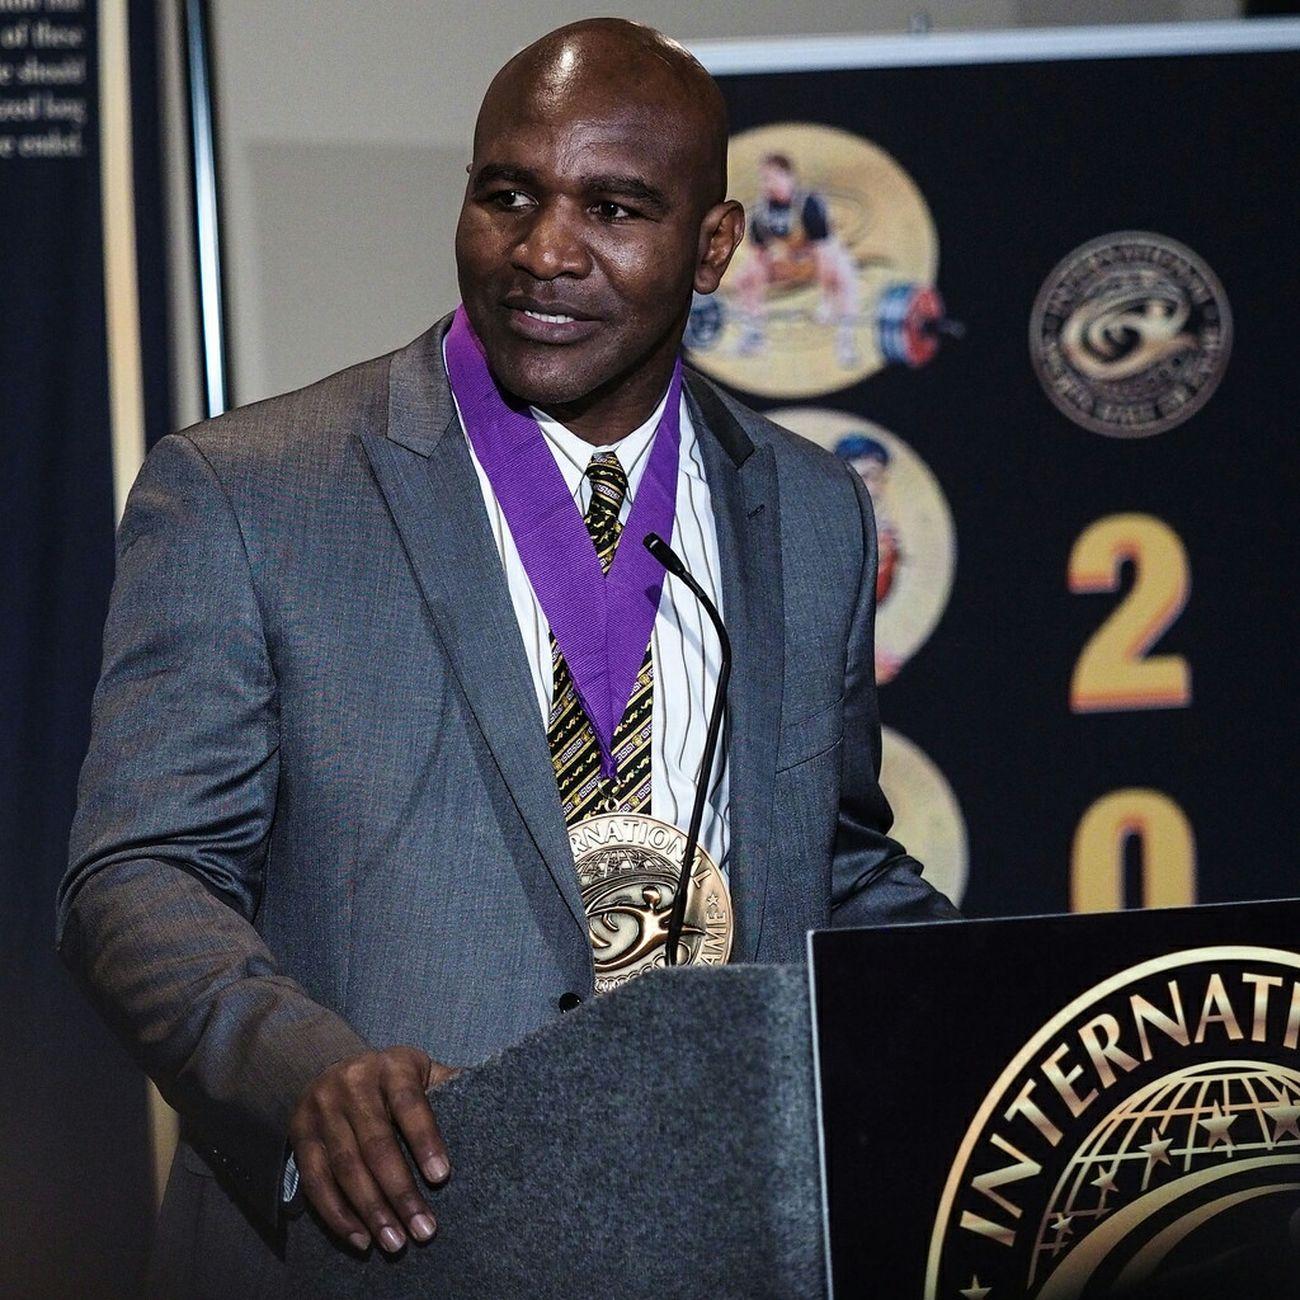 Evanderholyfield Realdeal Internationalsportshalloffame Inductee Arnoldfitnessexpo Boxer Boxing